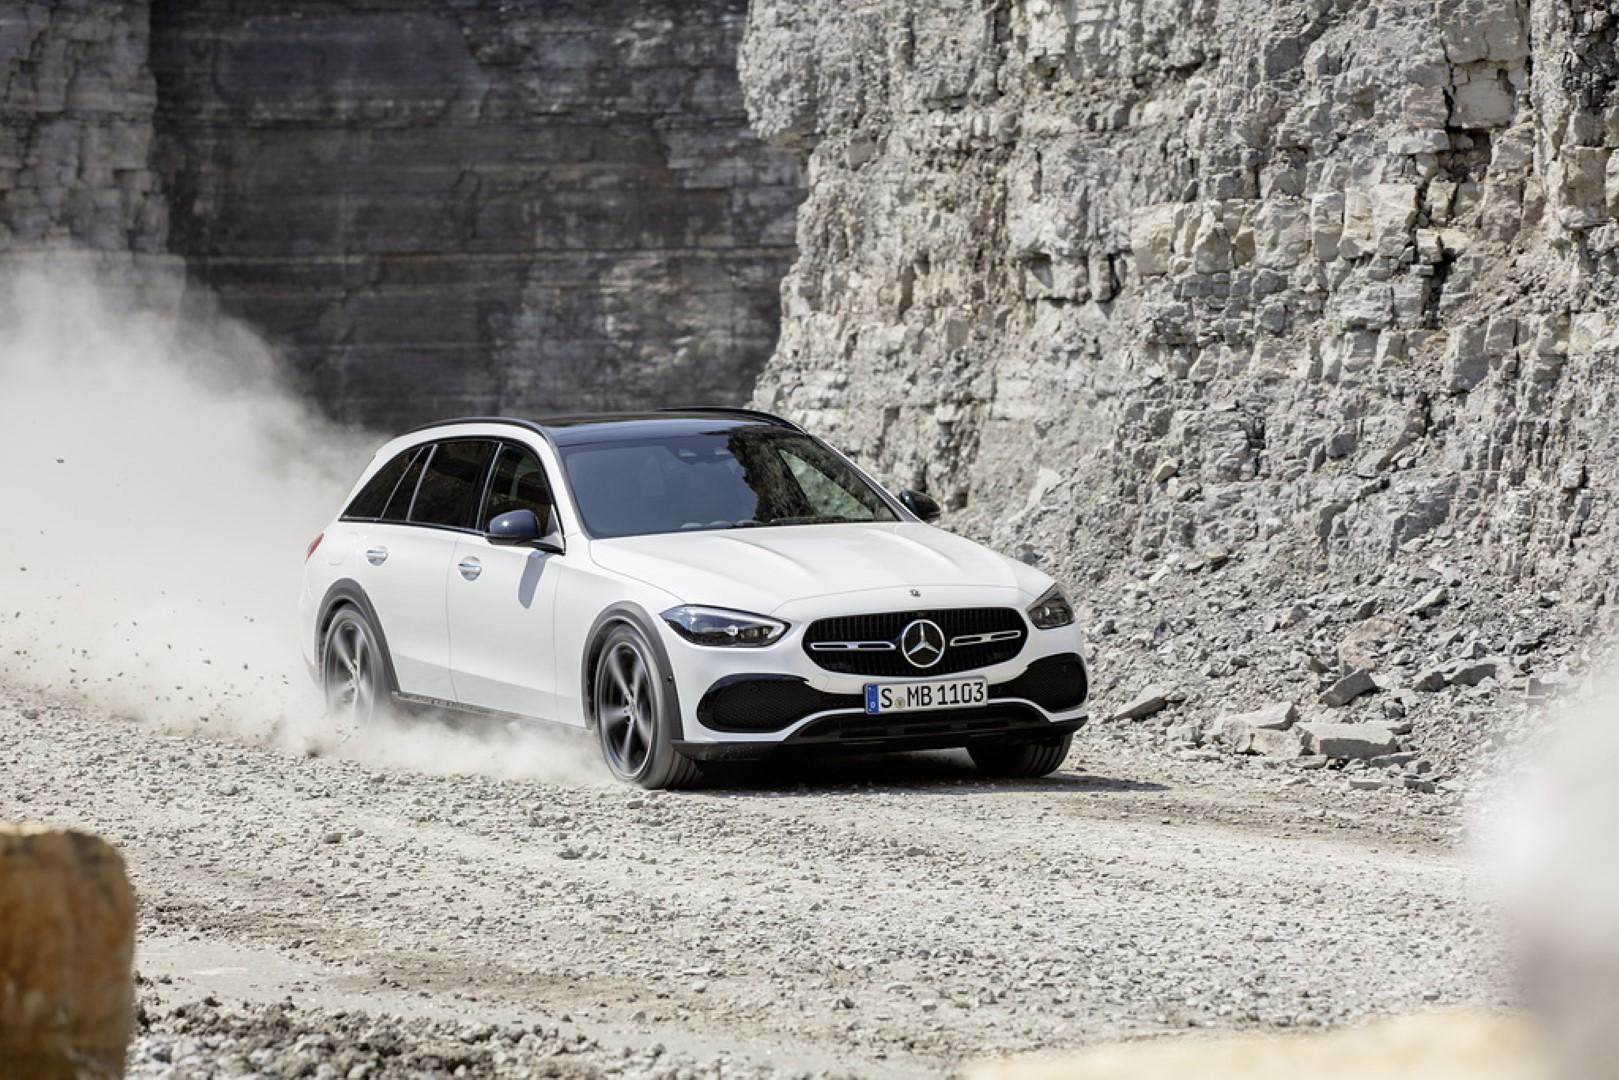 Mercedes-Benz C-Class Estate All-Terrain